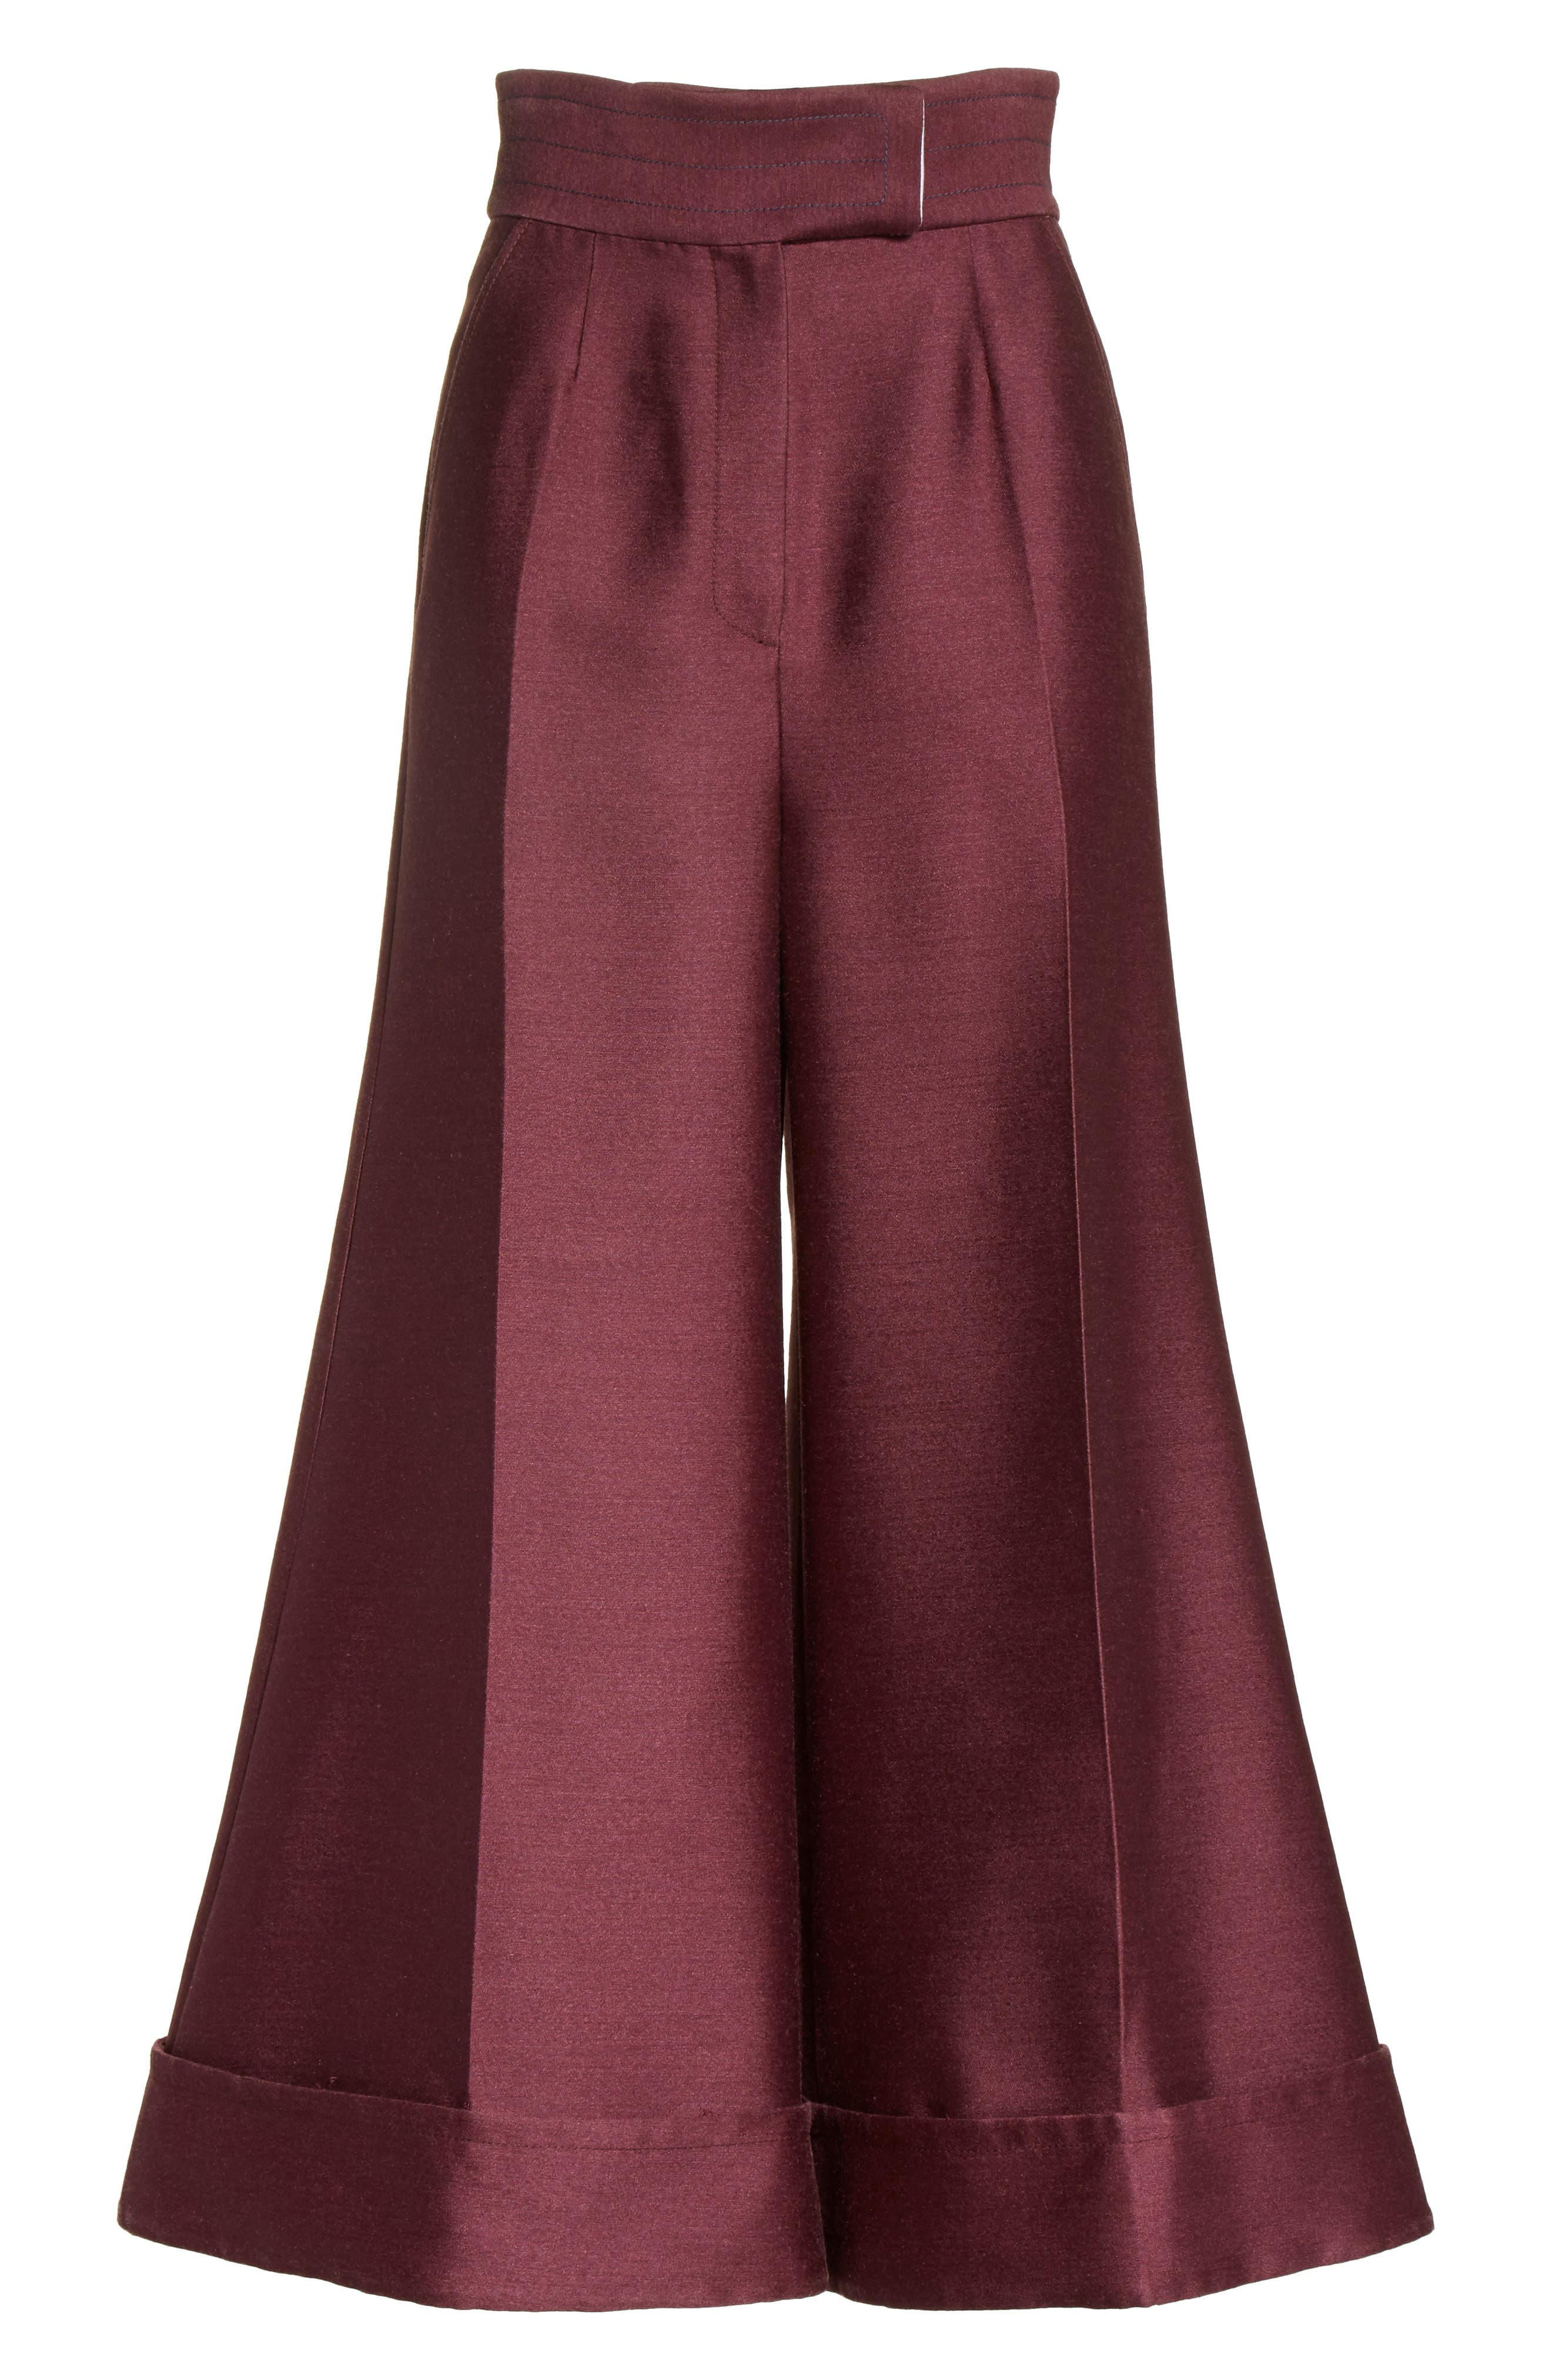 Sina Wide Leg Trousers,                             Alternate thumbnail 9, color,                             Plum